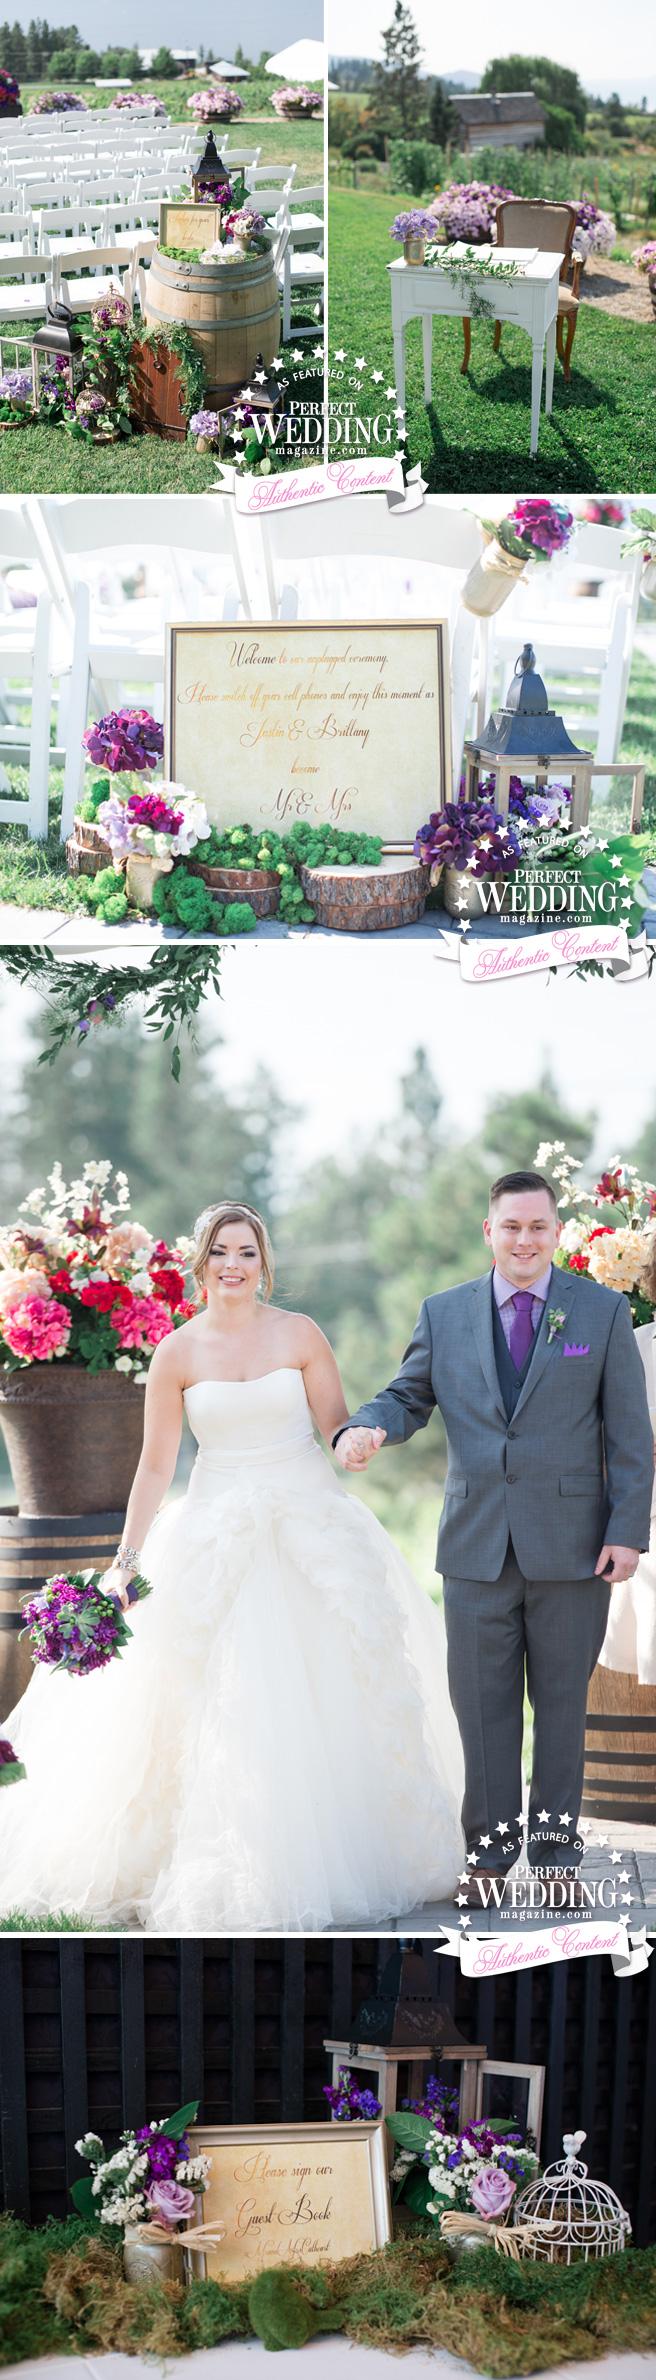 Perfect Love, Perfect Wedding Magazine, Secret Garden, Vera Wang Bride, Blush Occasions, Perfect Wedding Magazine blog, Okanagan Weddings